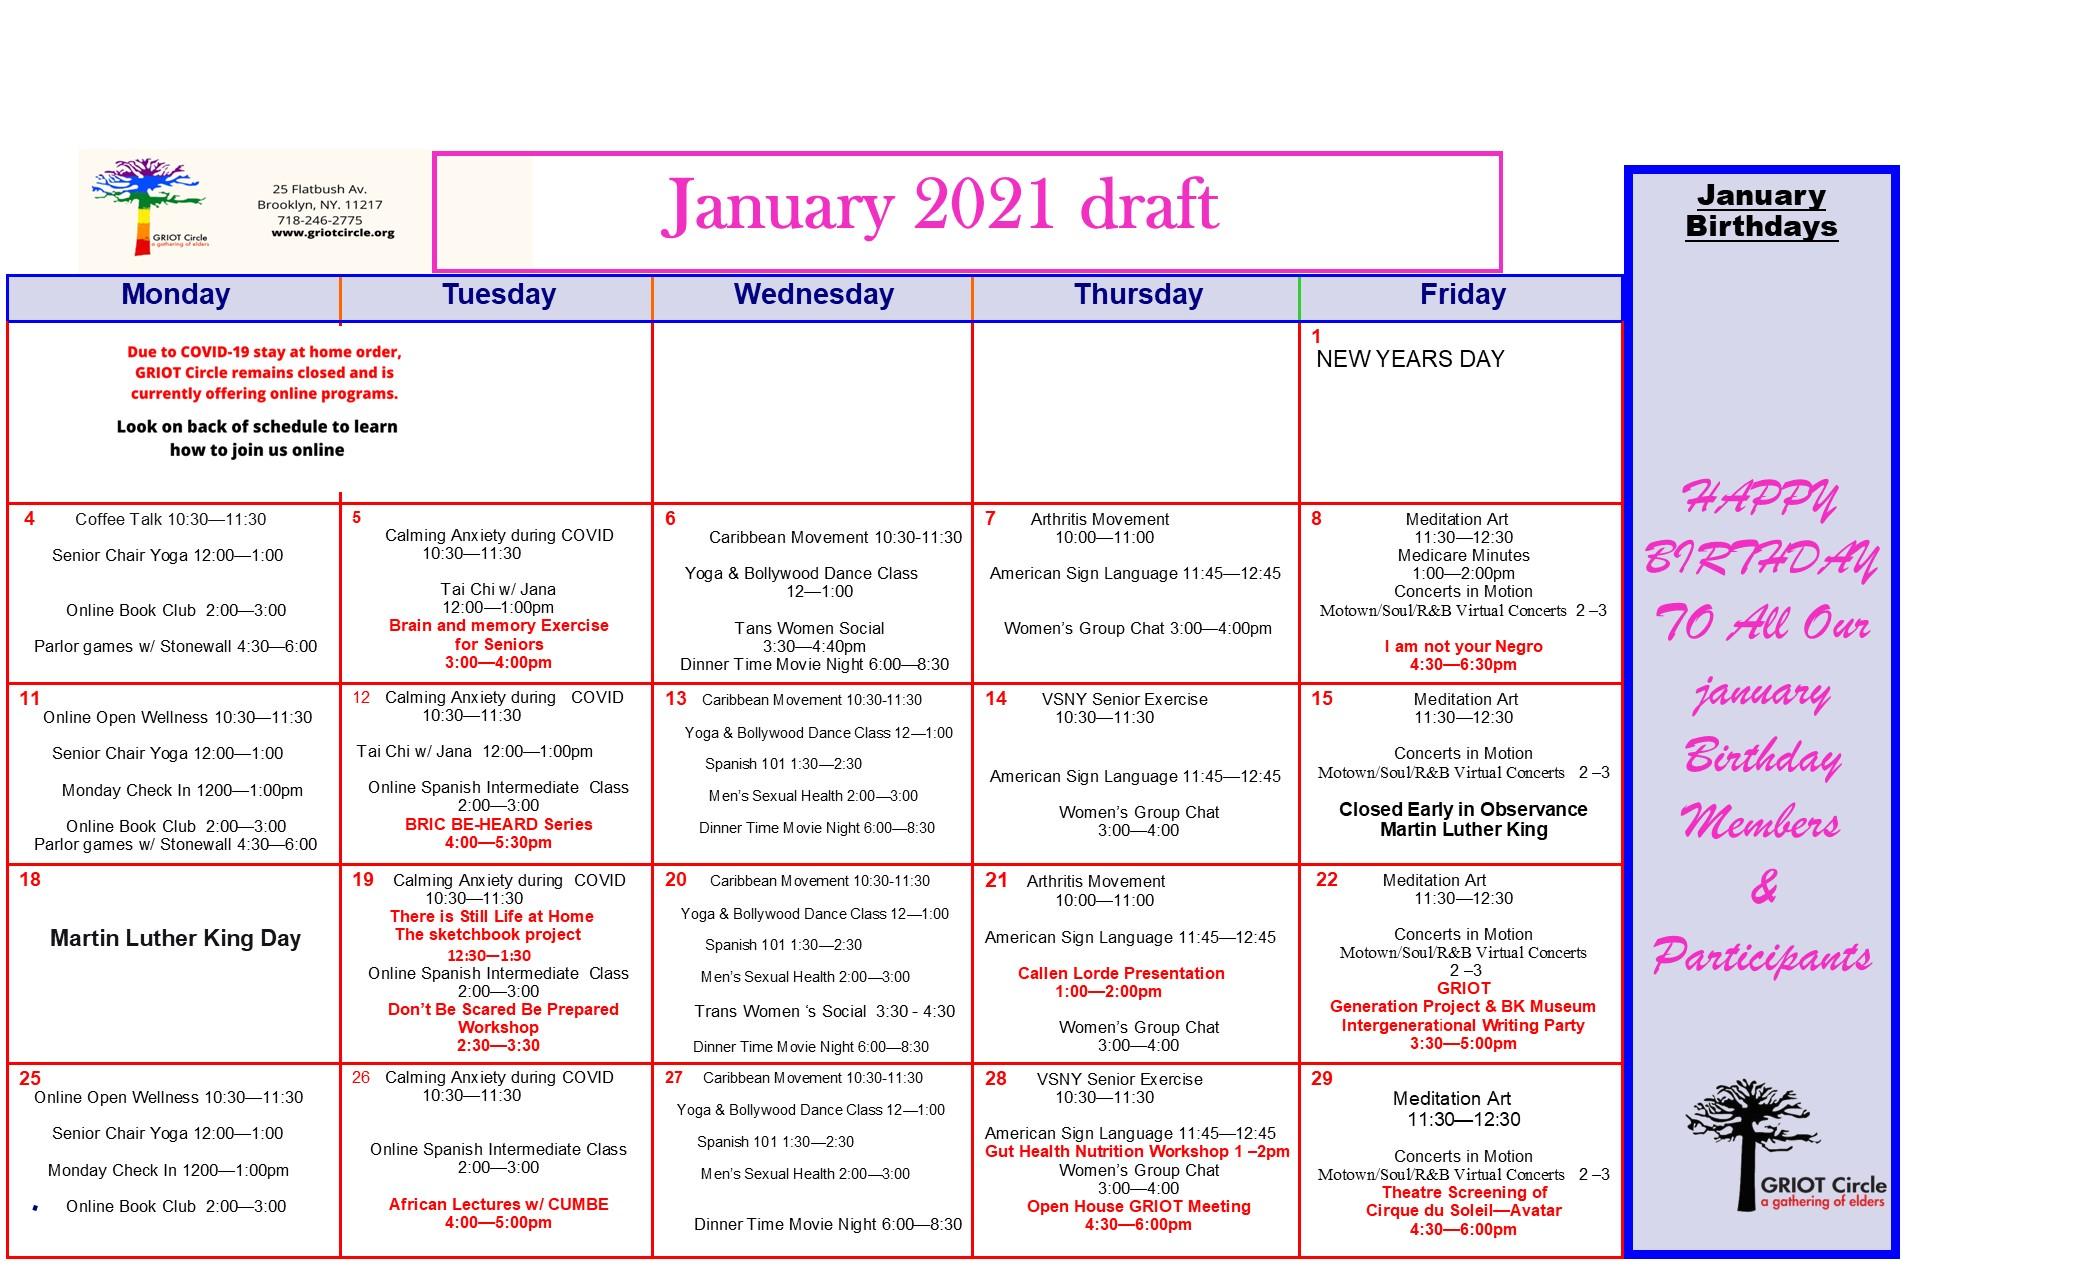 January 2021 with edits.pub